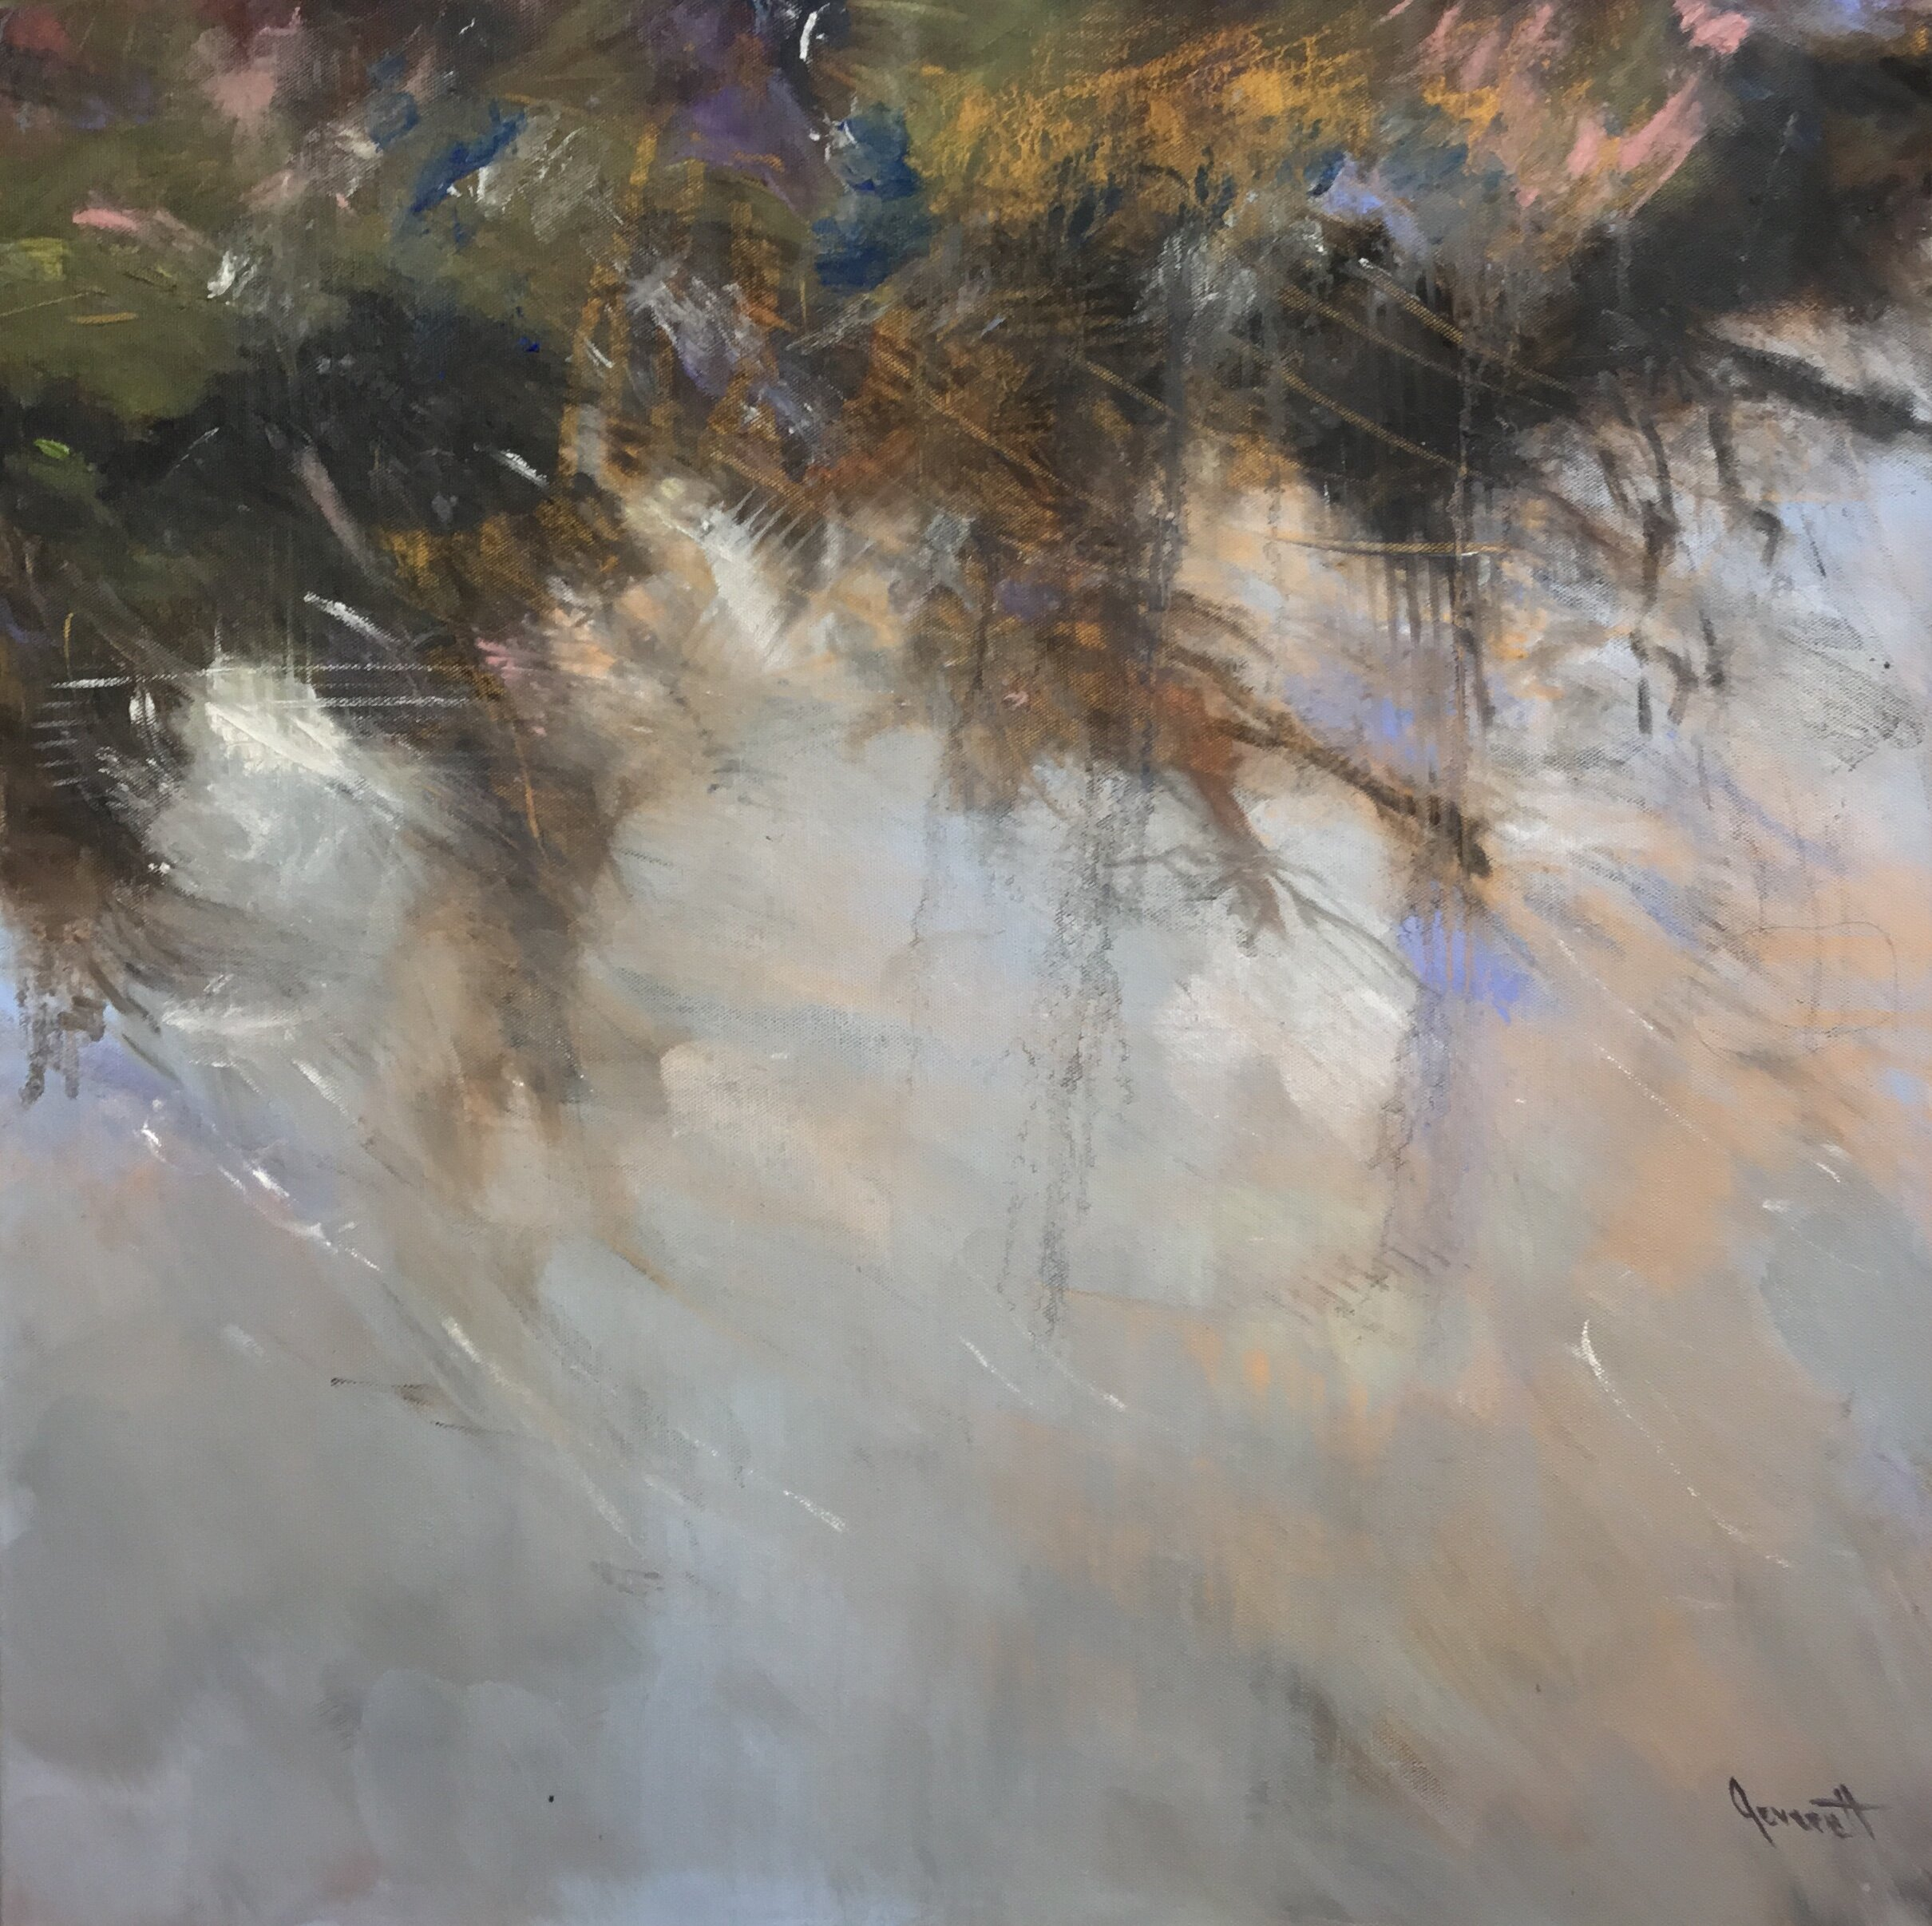 "Slipstream I, 24 x 24"", oil on canvas"